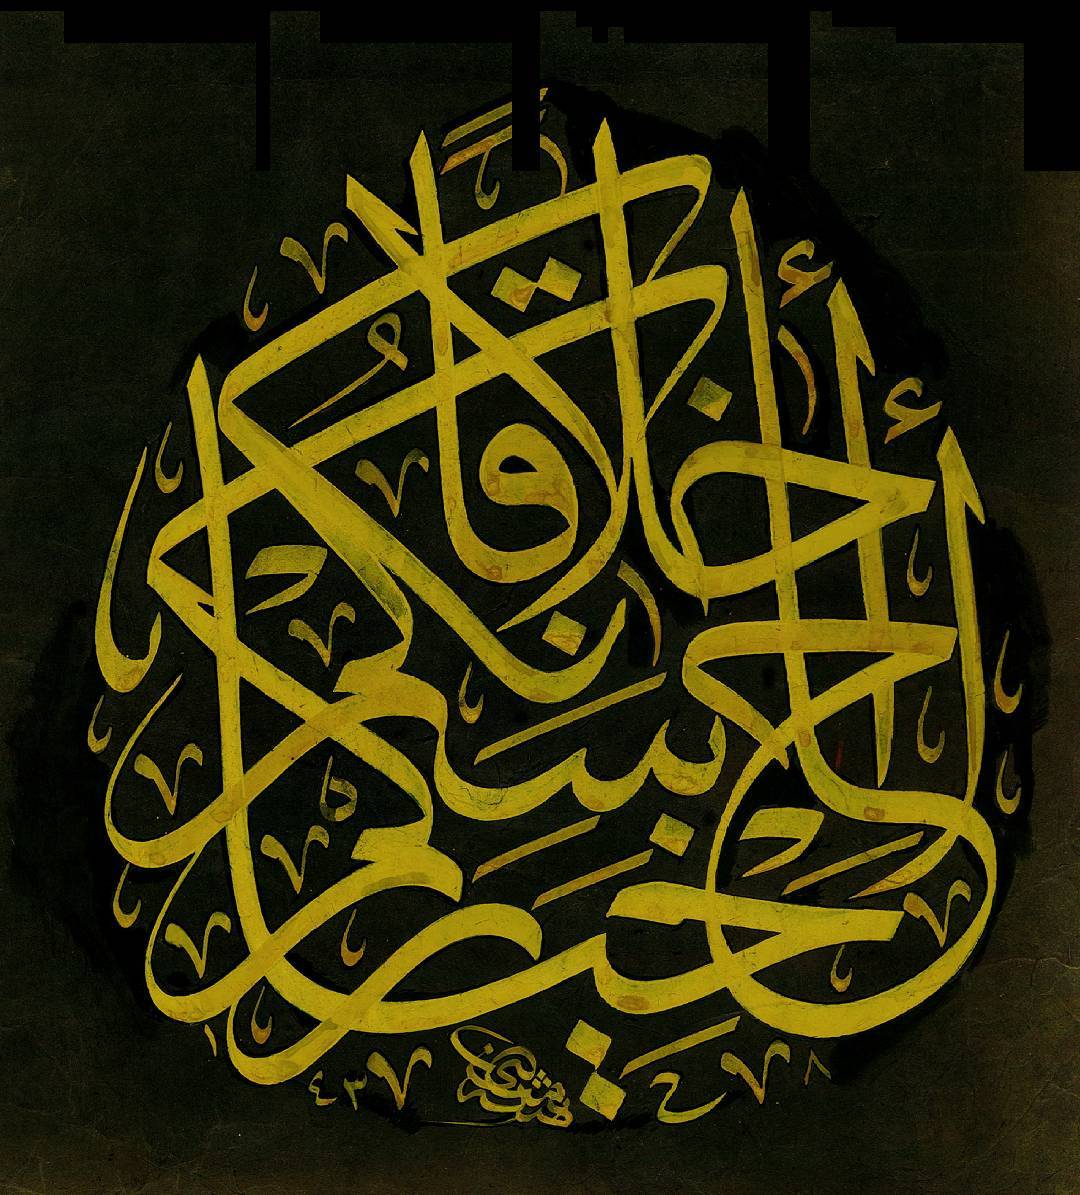 khat/hat/kat Tsulust/Thuluth Mothana Alobaydi خياركم احاسنكم اخلاقا #خط_عربي #خط_اسلامي #فن_اسلامي #فن #خط #مثنى_العبيدي #خطا... 310 1